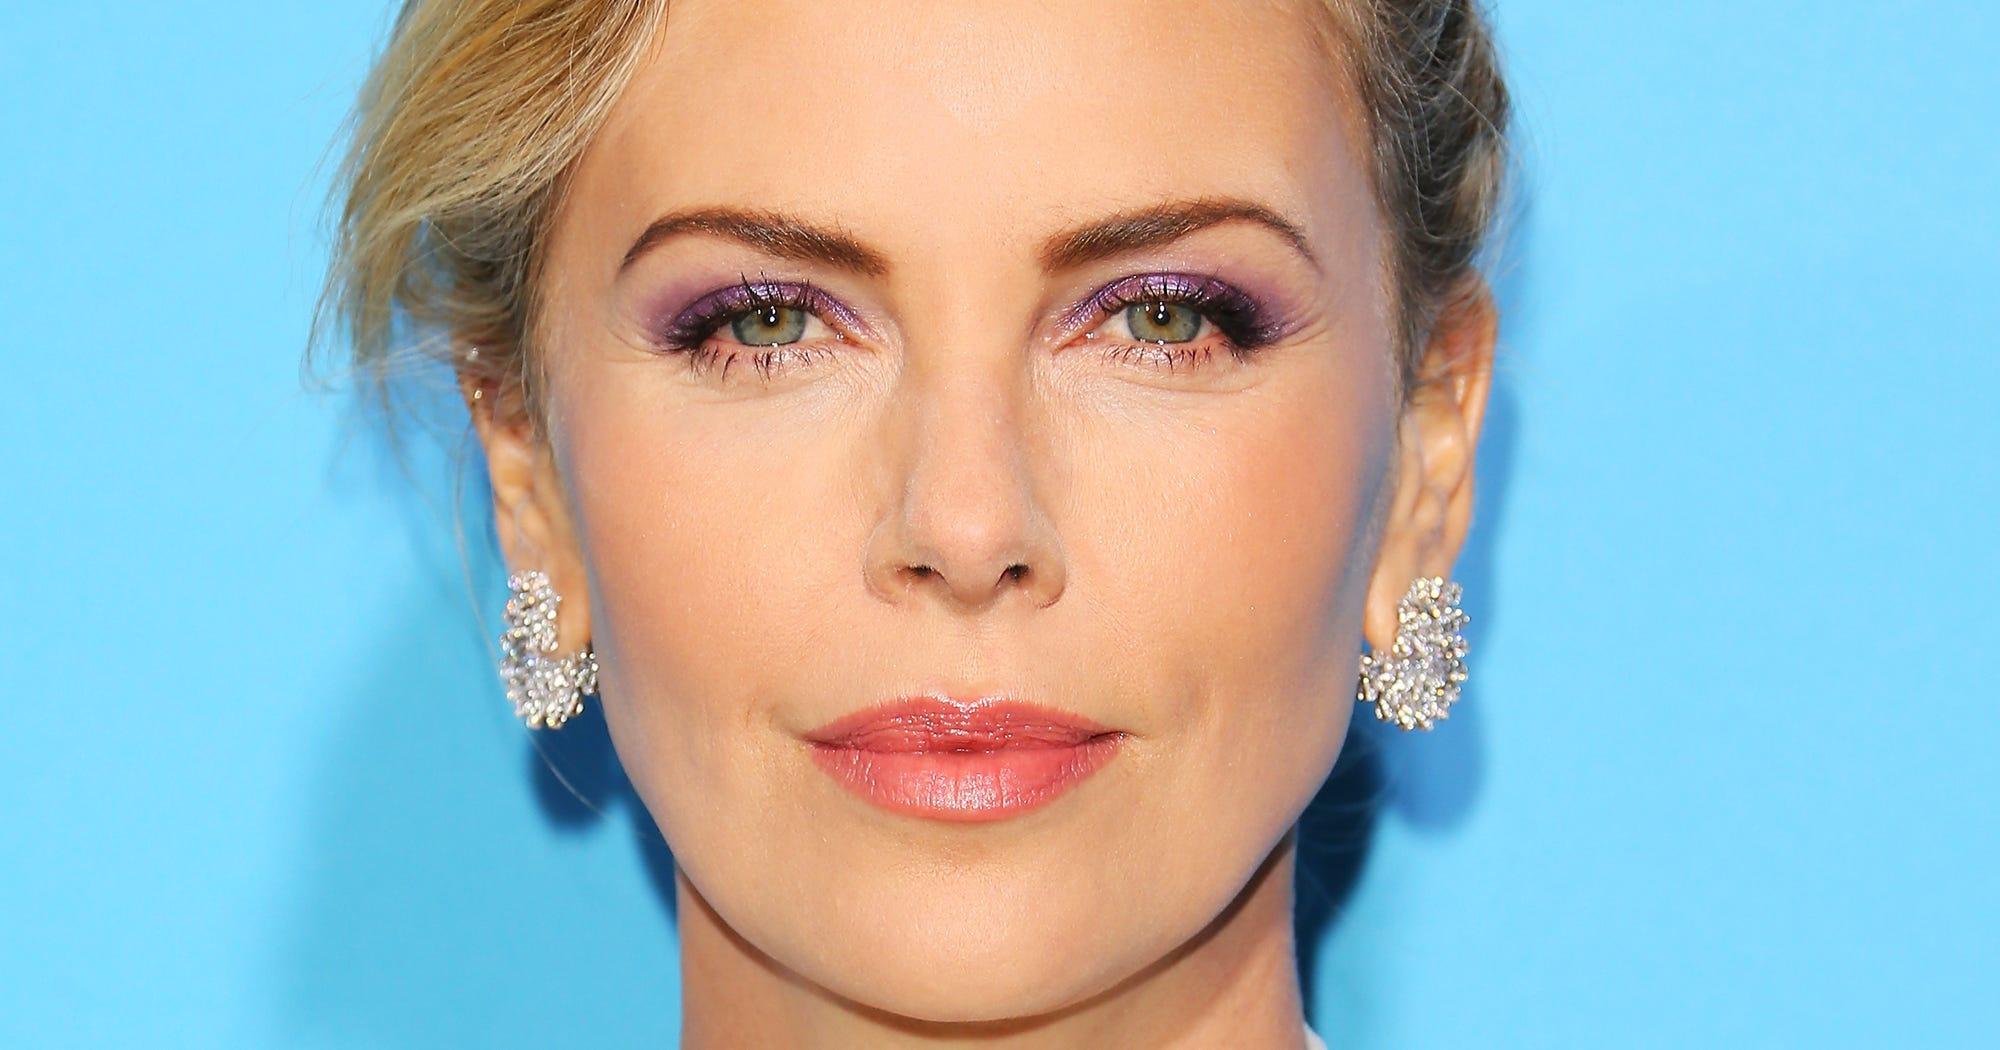 The Bright Makeup Look That Minimalists Will Still Love